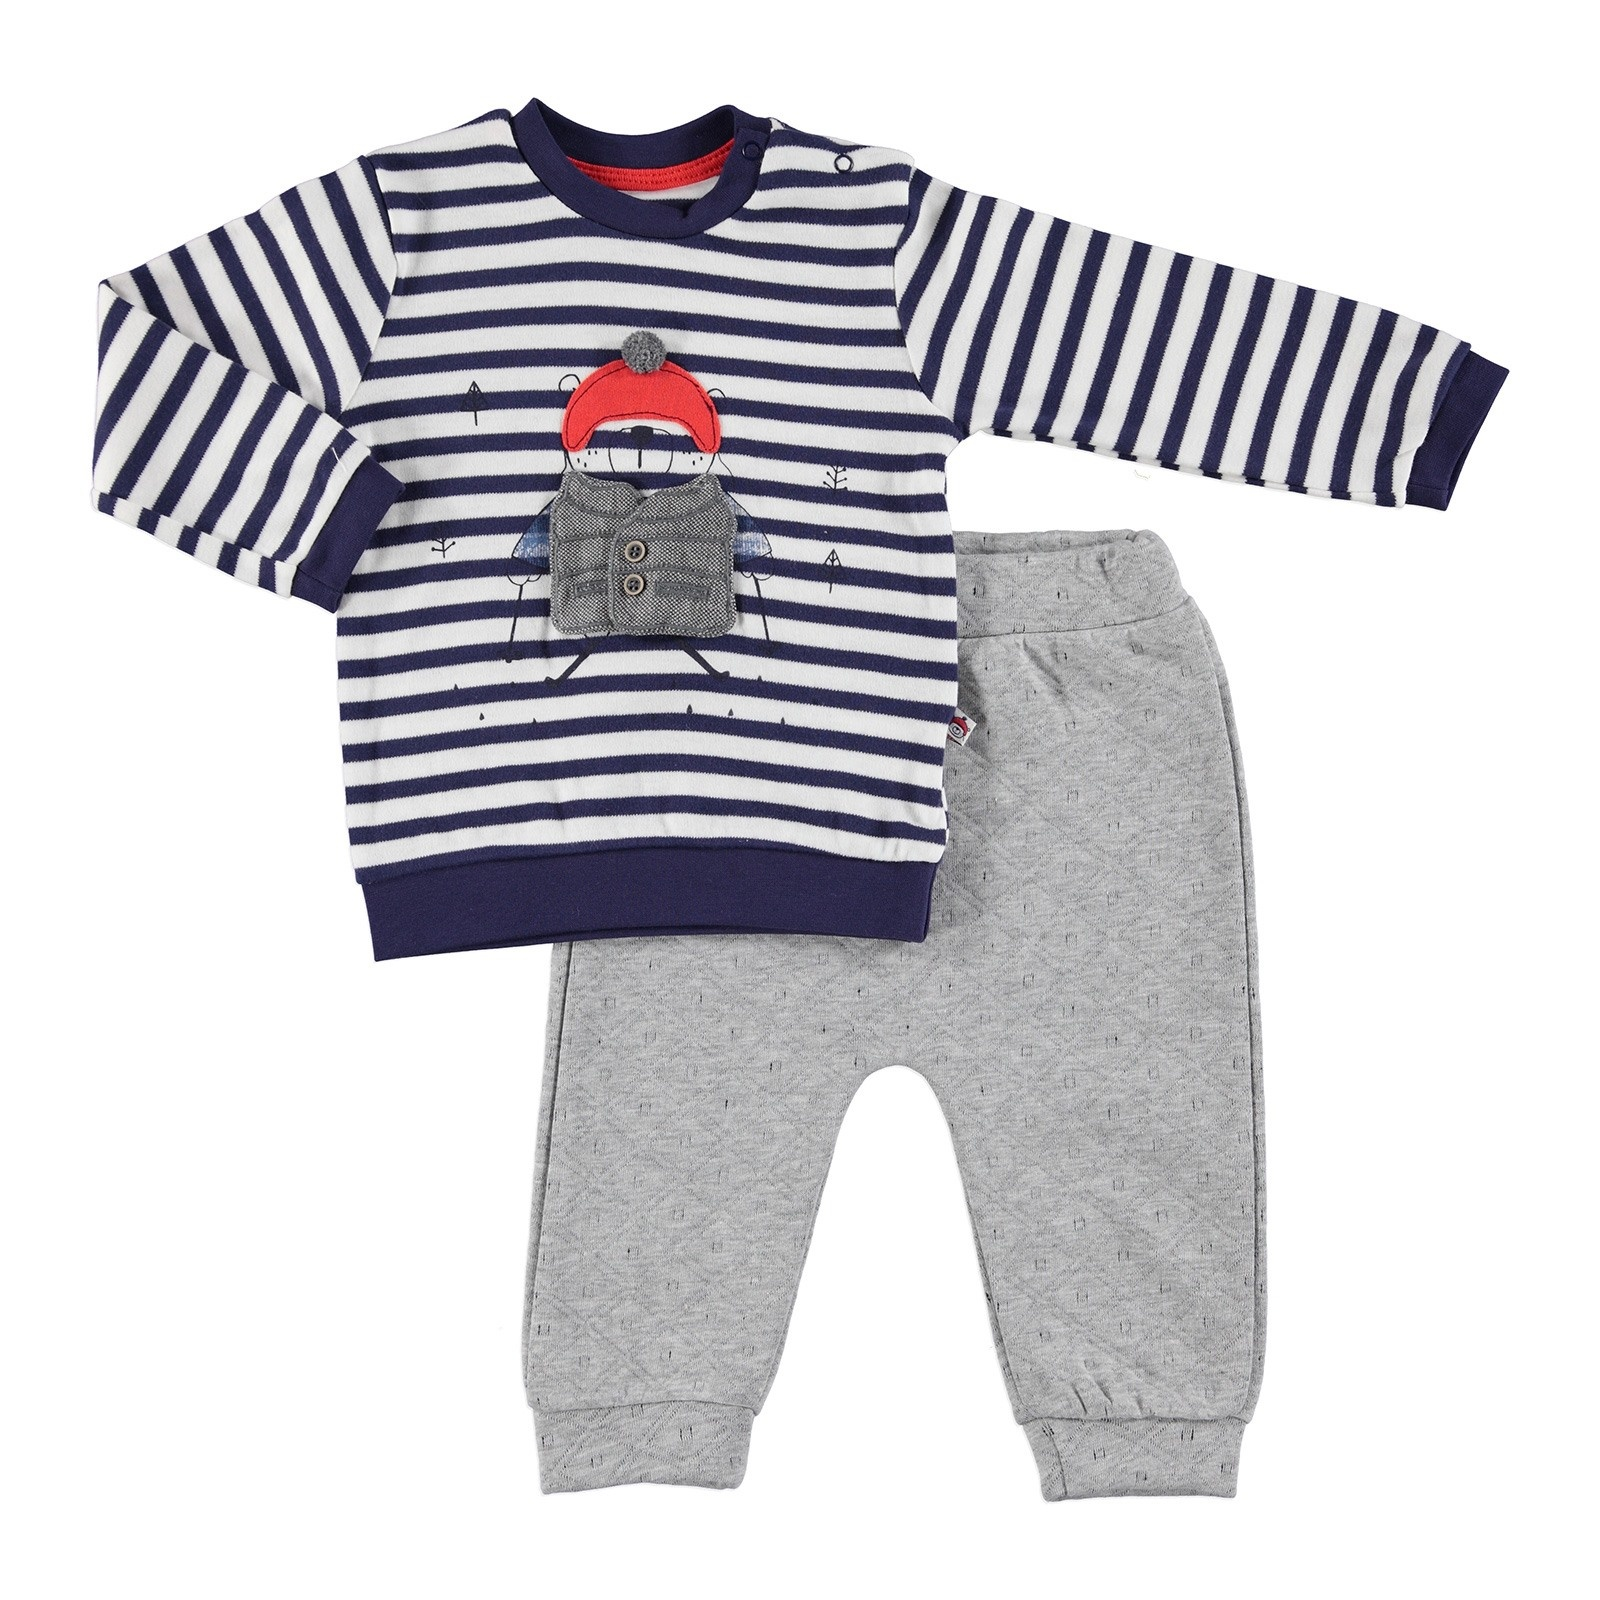 Ebebek Mymio Skateboarder Bear Baby Sweatshirt Trouser 2 Pcs Set